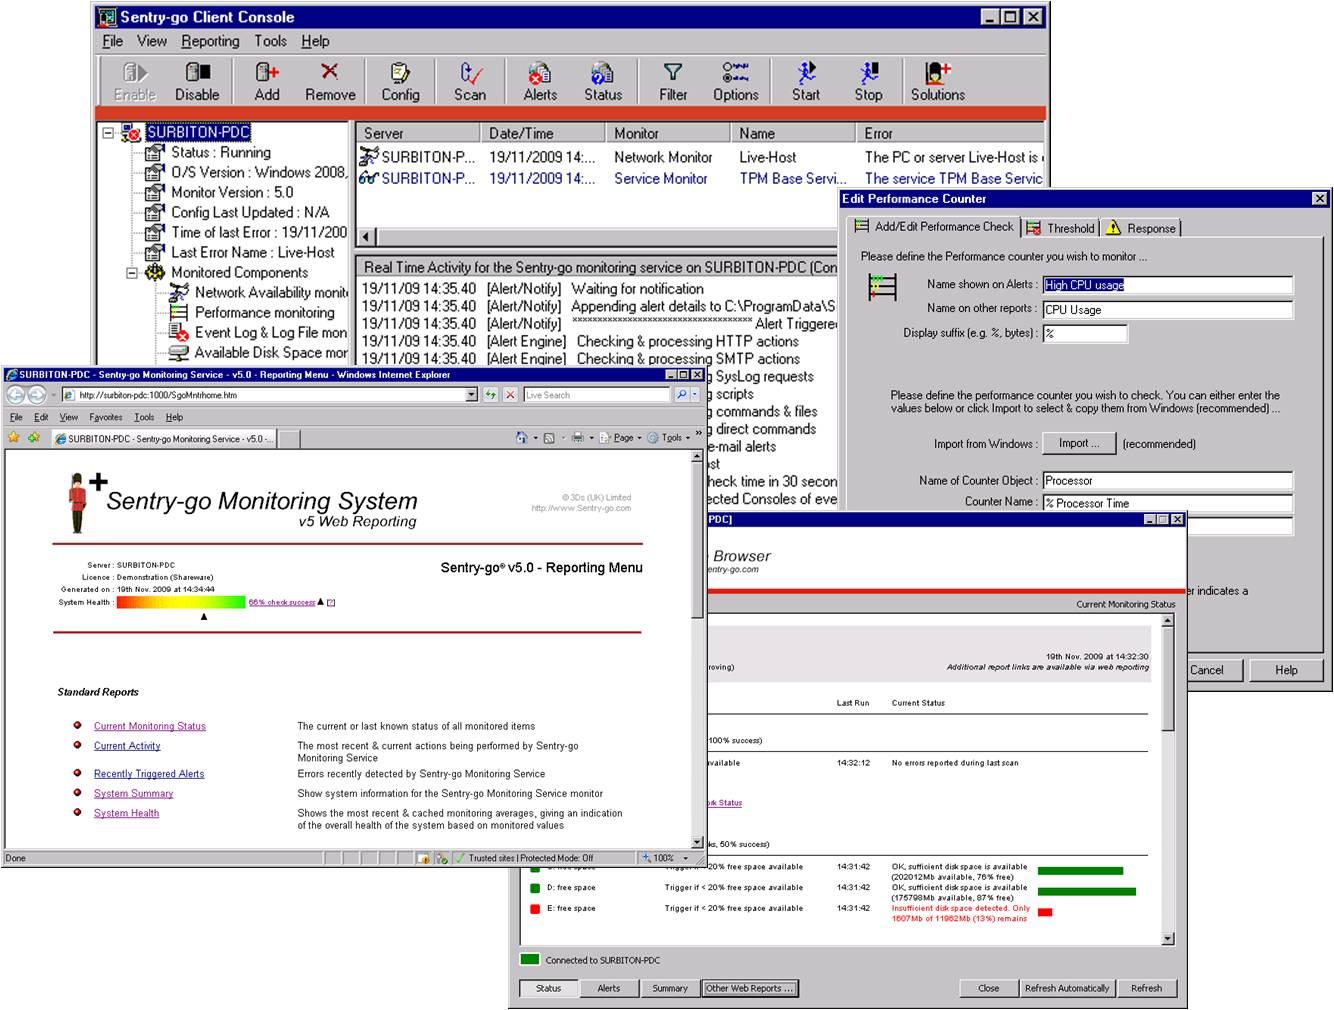 Sentry-go Quick IIS Web Monitor